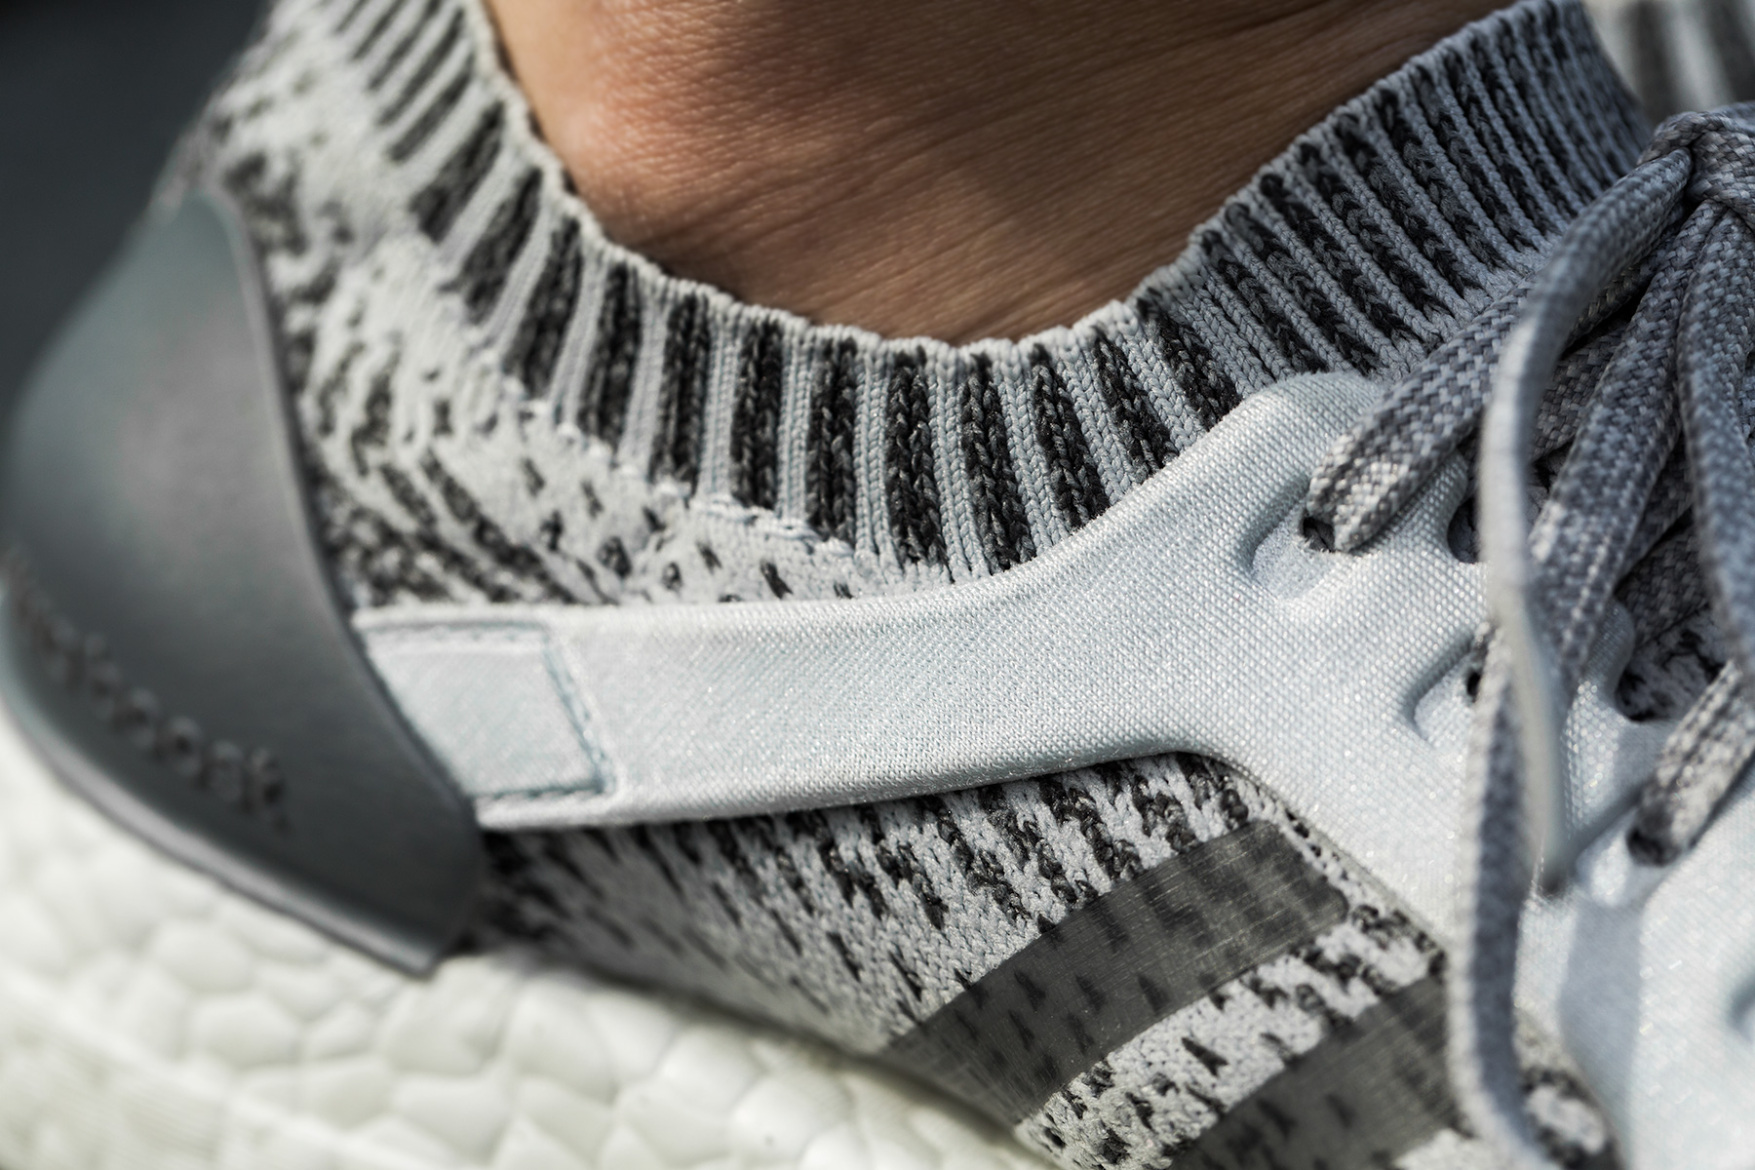 adidas ultraboost x closer look - 92560